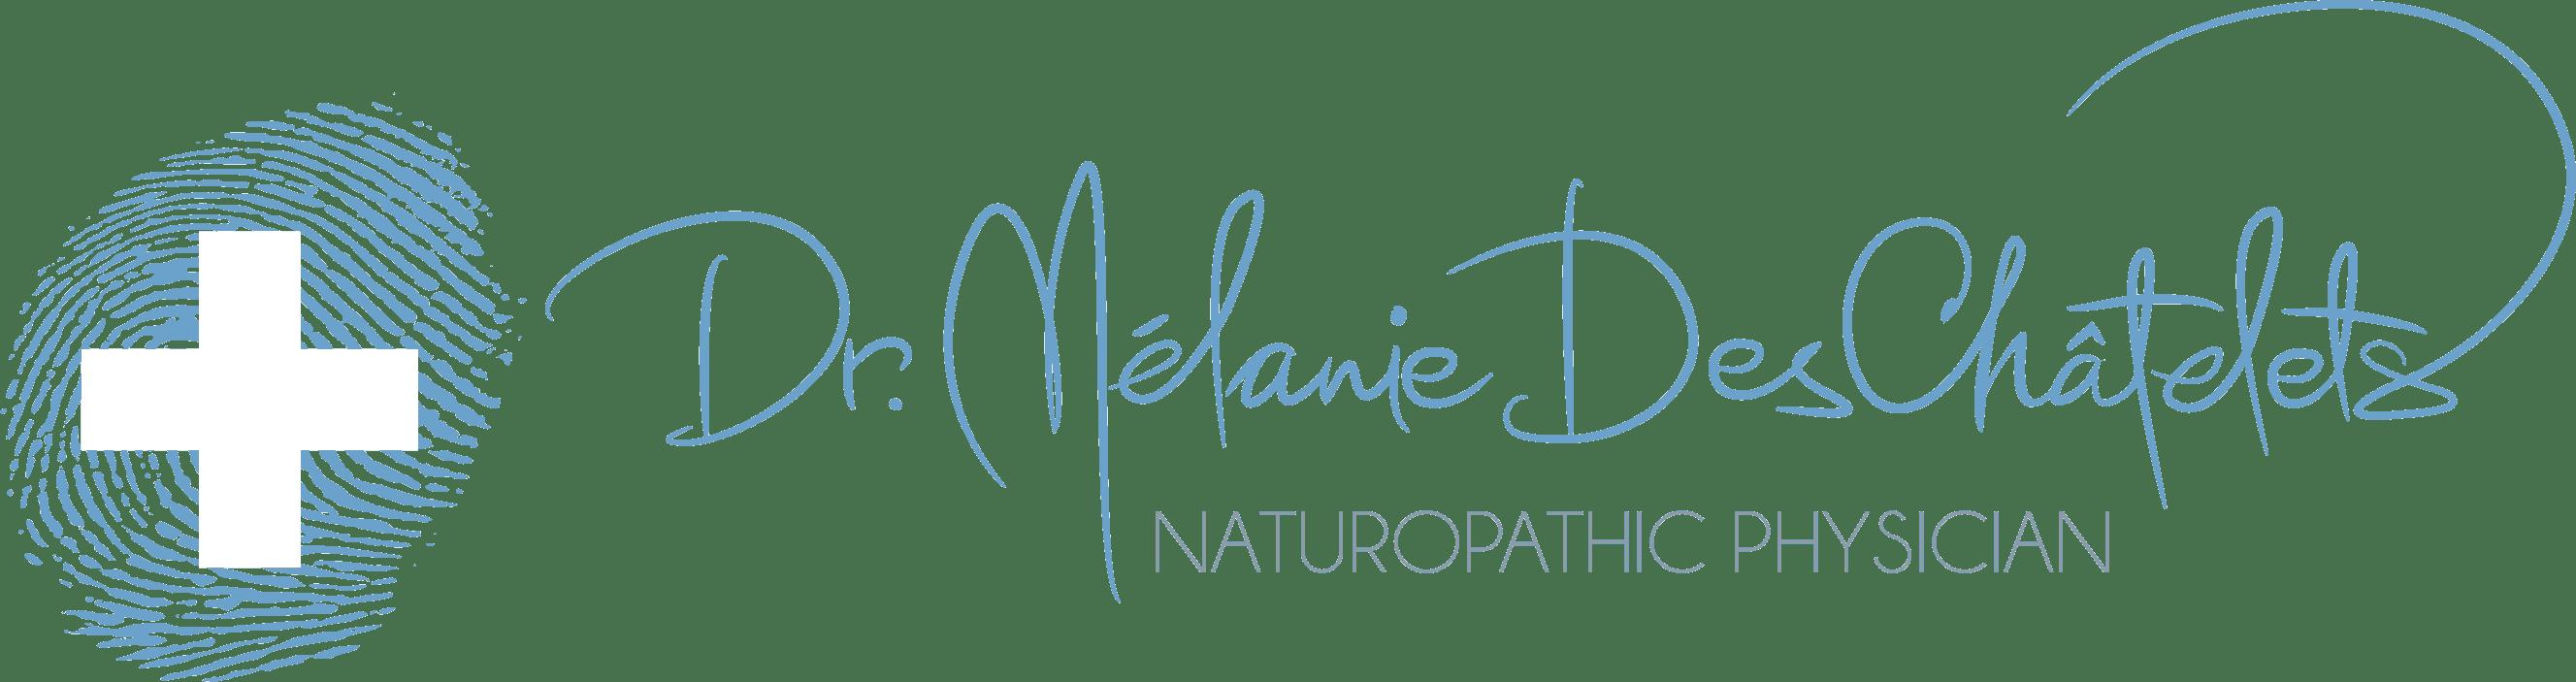 Dr Mélanie DesChâtelets ND : Naturopath Burnaby & Telemedicine BC